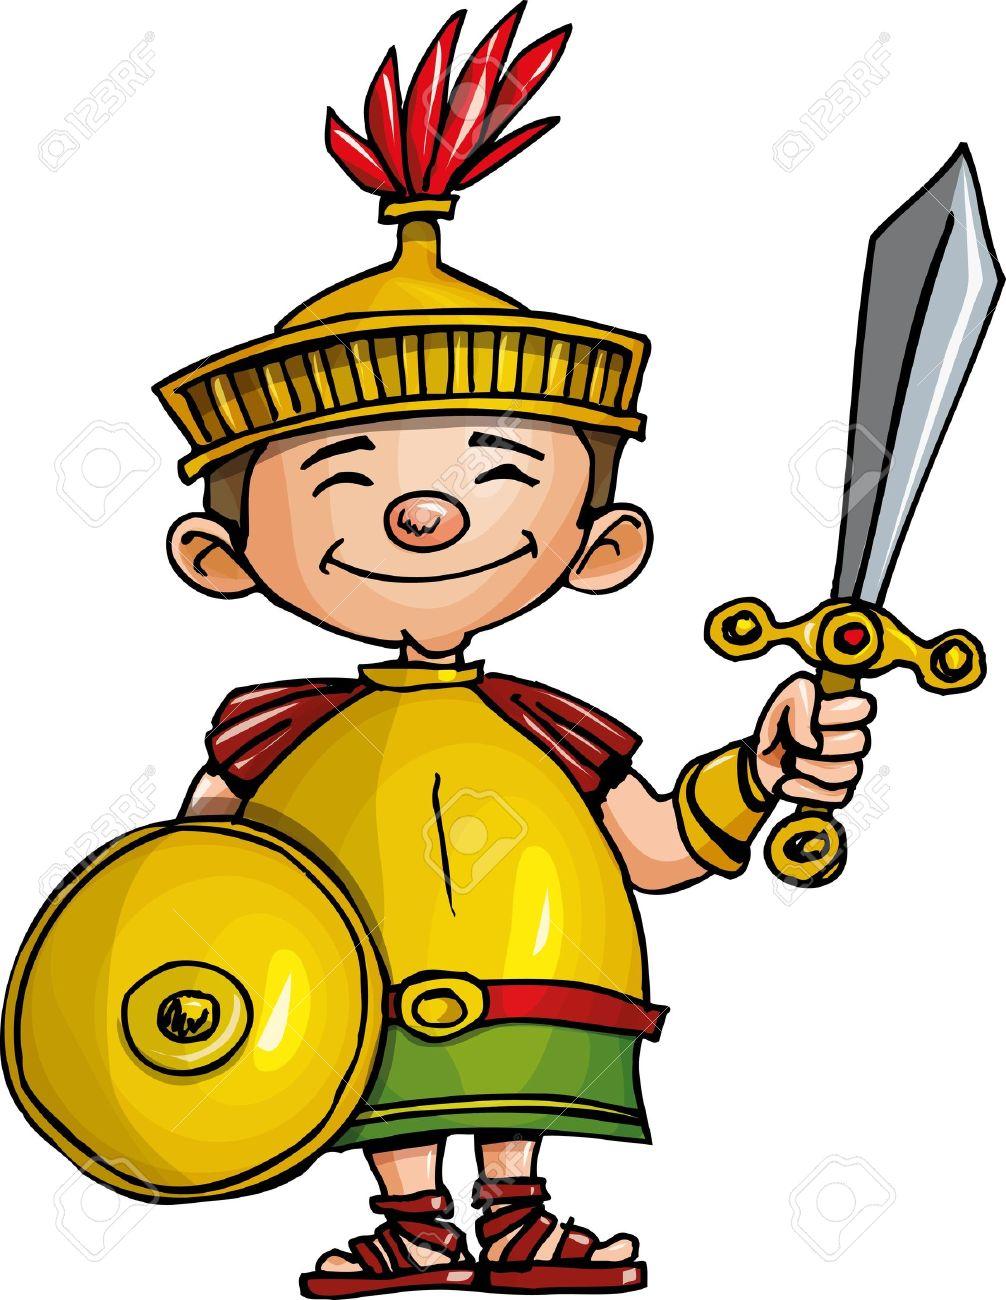 Cartoon Roman legionary with sword and shield. Isolated on white Stock Vector - 9630583